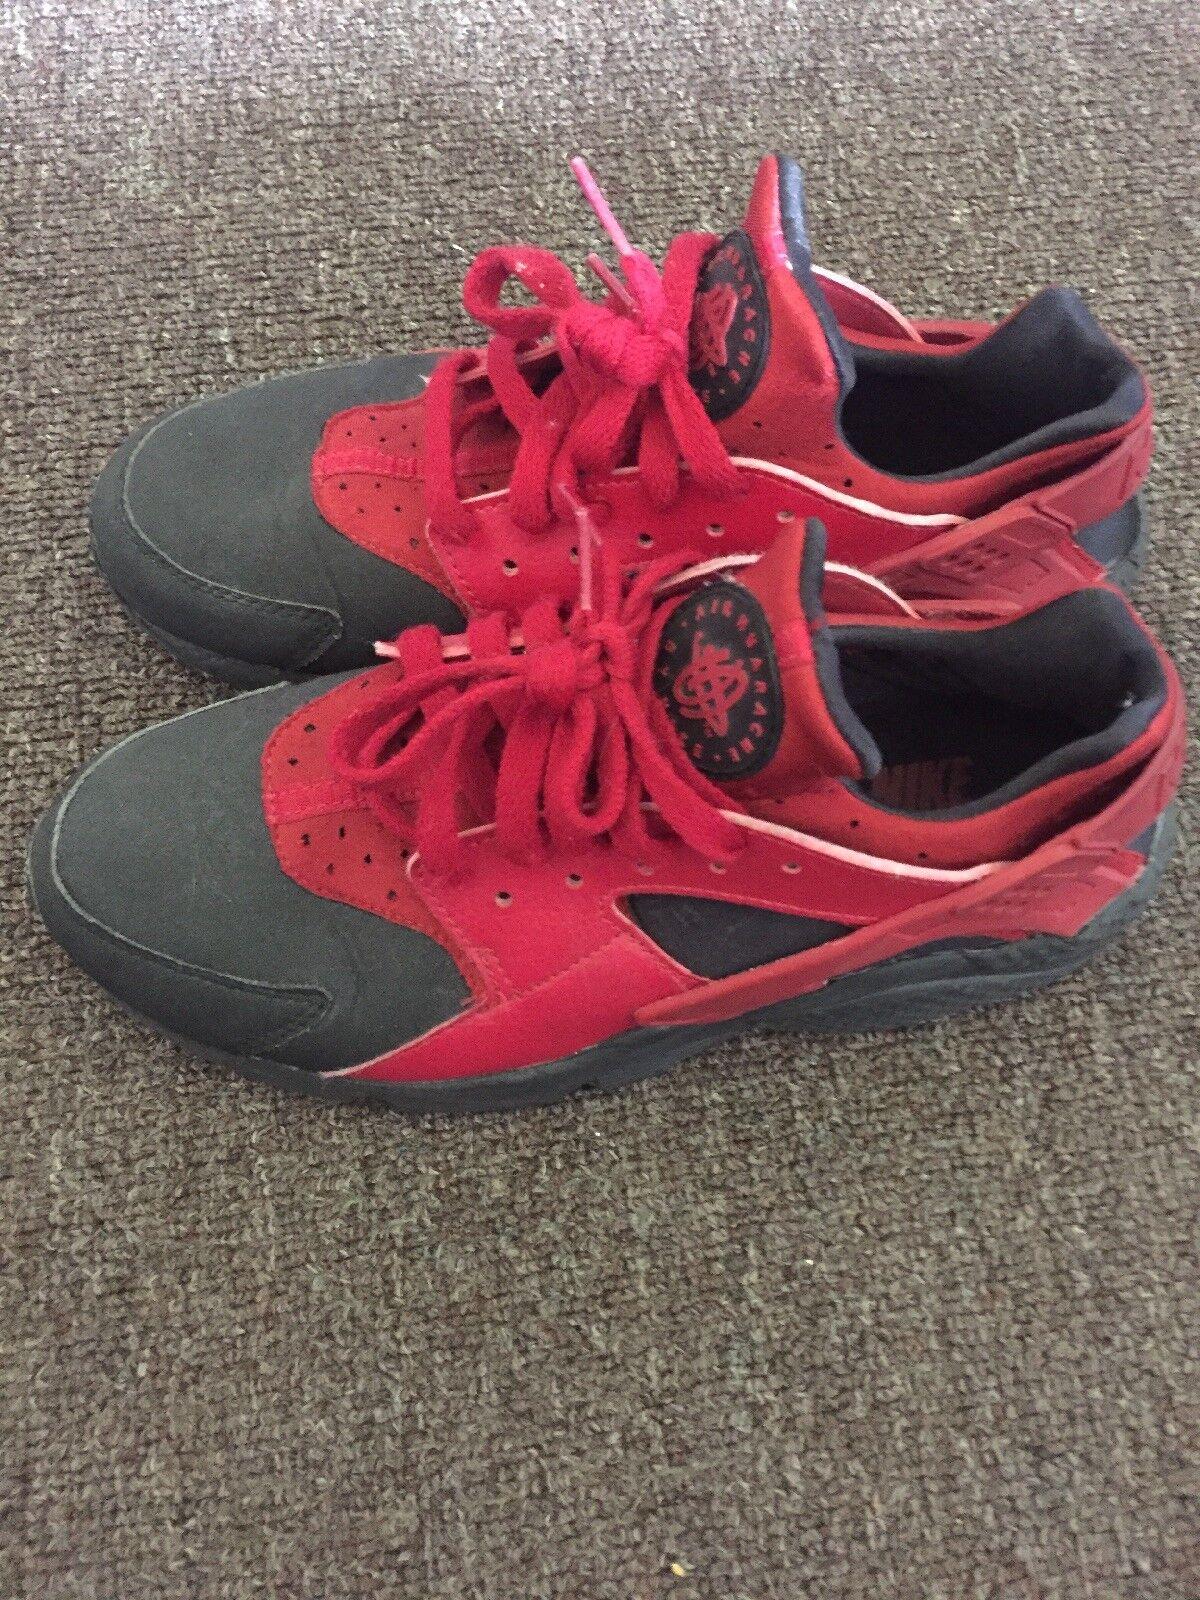 Nike Hurache Customized Red and Black size 9 Cheap women's shoes women's shoes